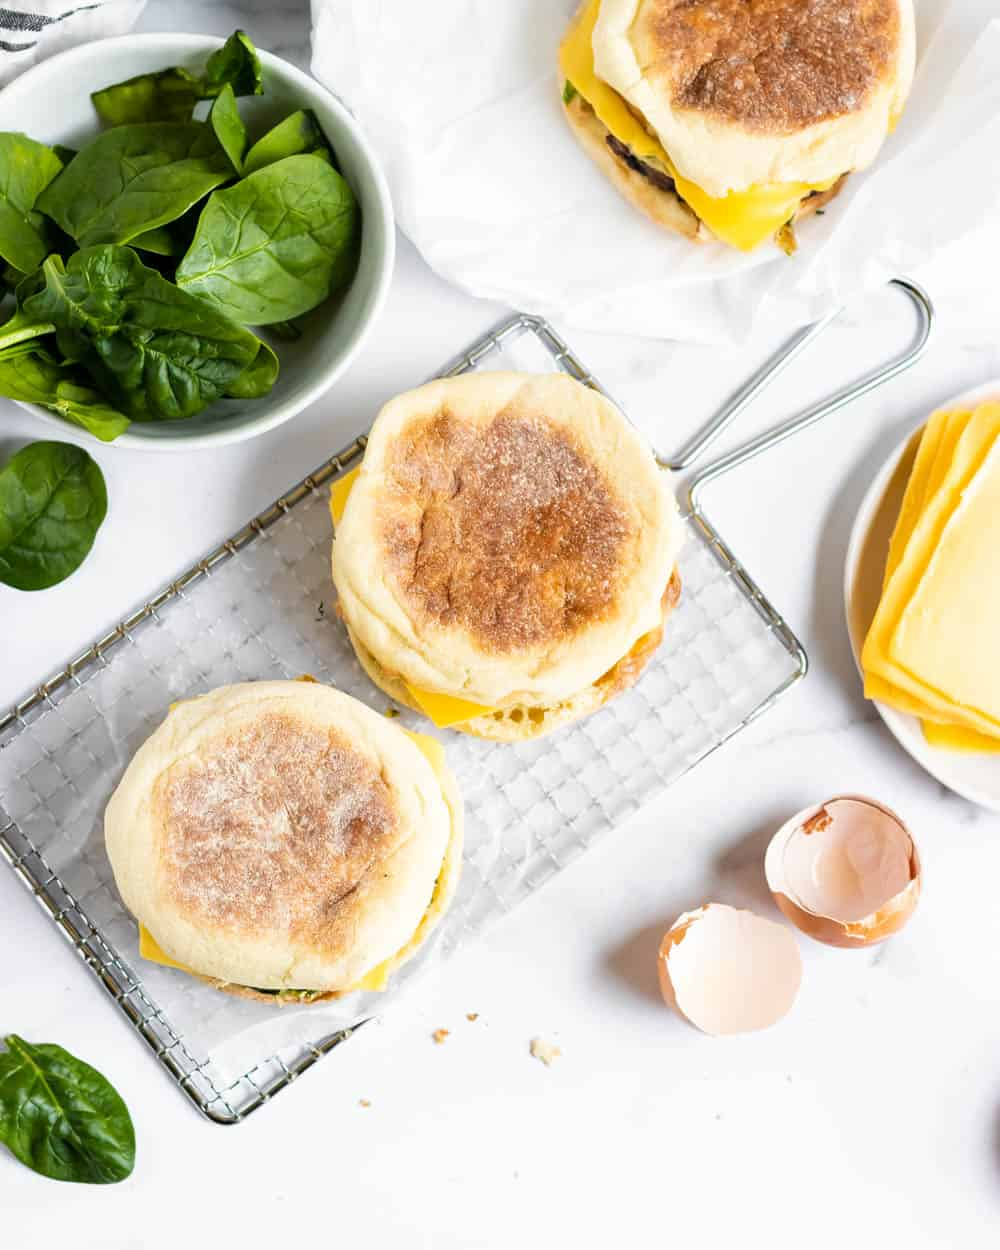 Overhead shot of breakfast sandwiches with ingredients surrounding.